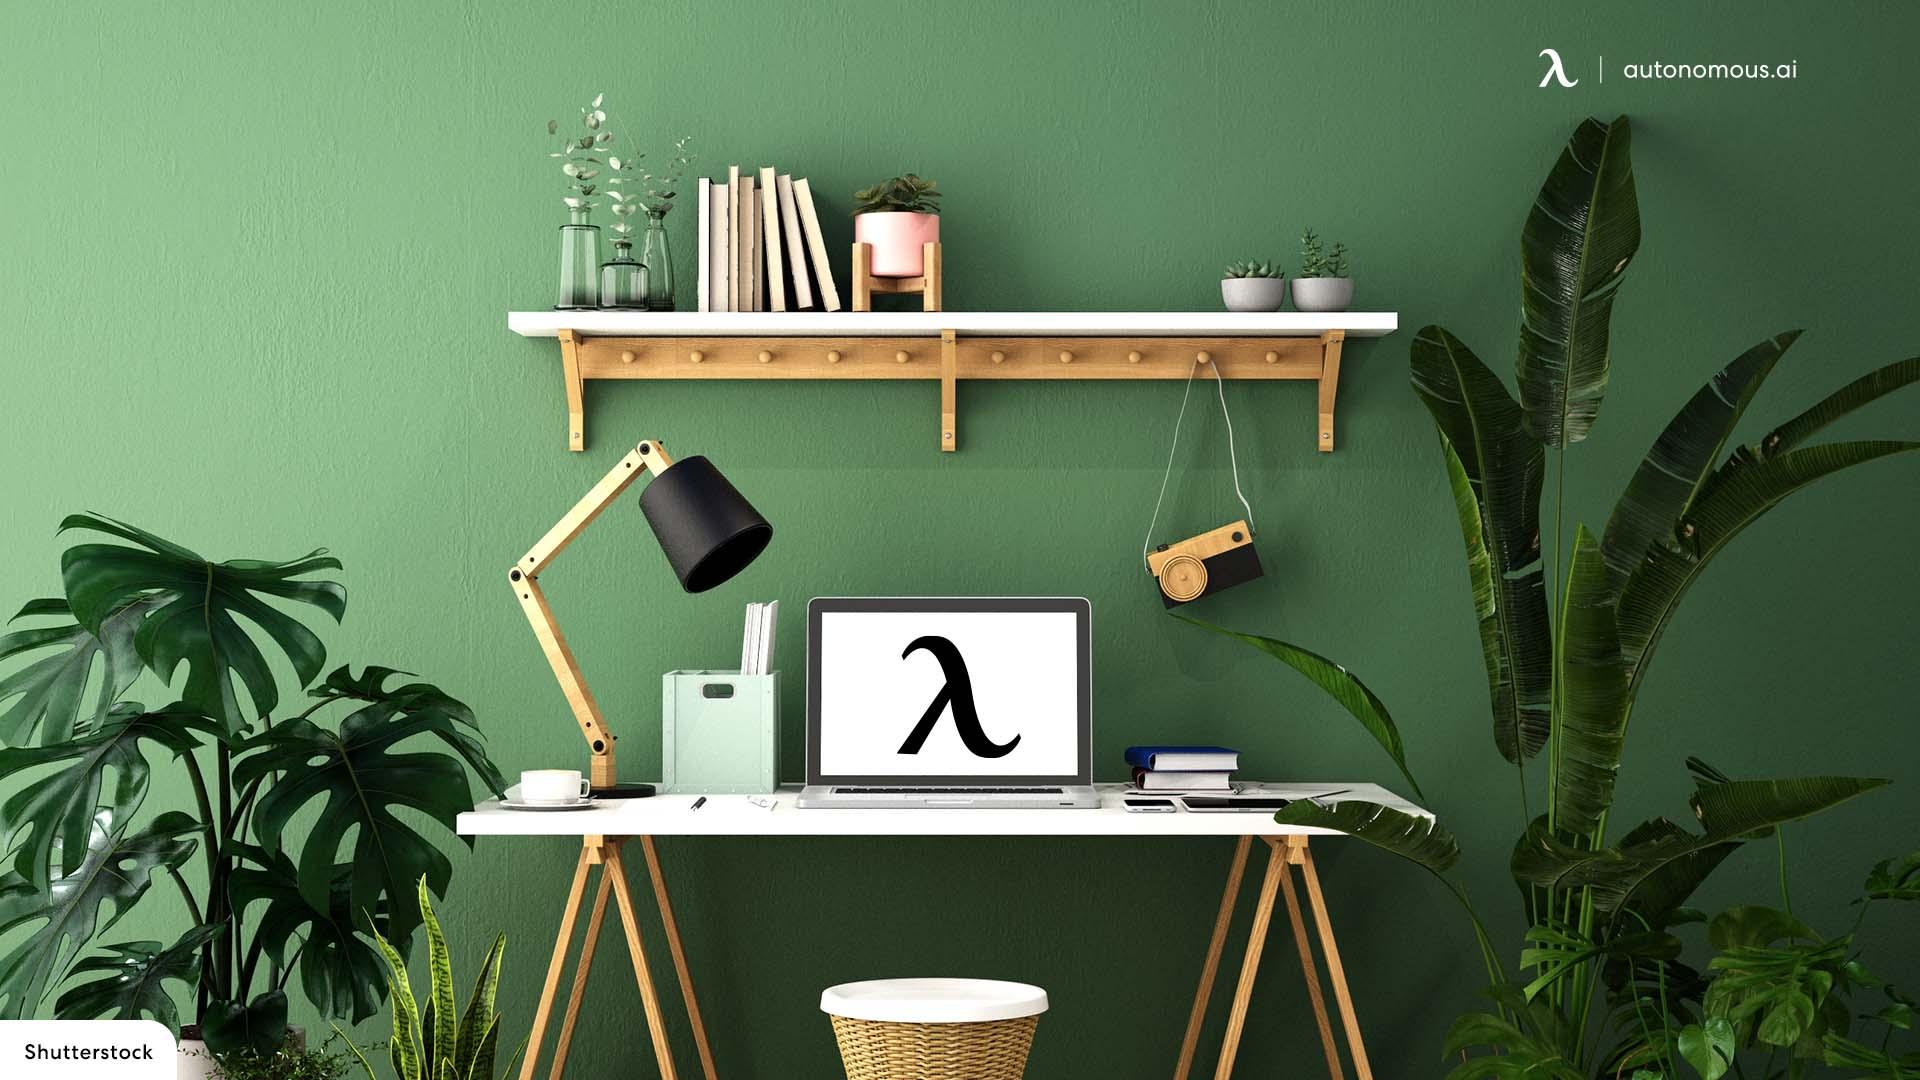 Cozy Aesthetic Desk Ideas with Plants